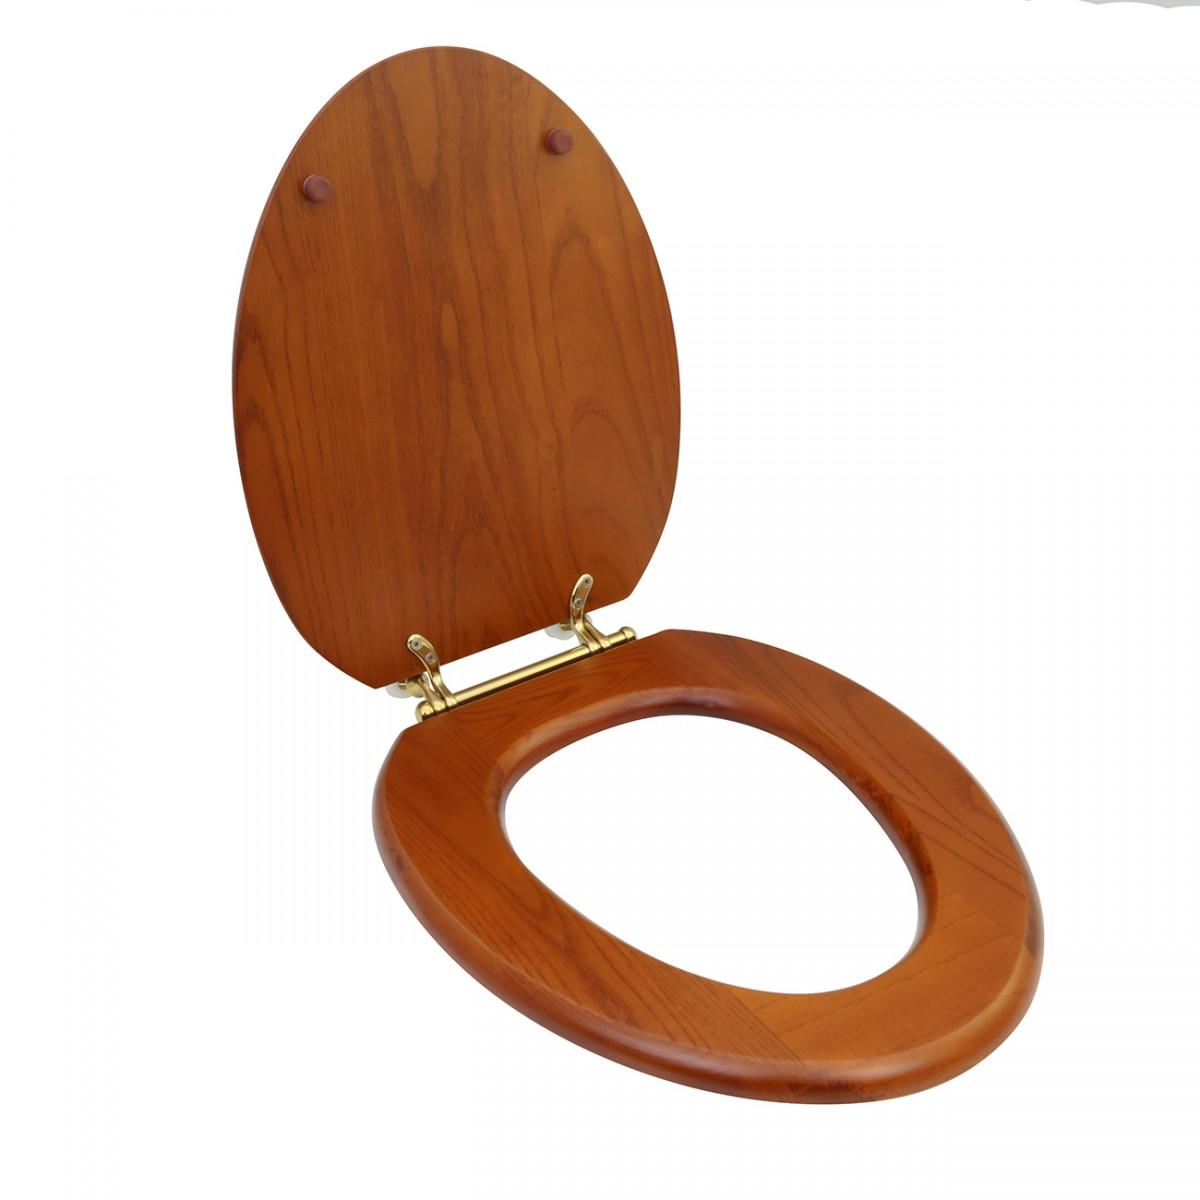 Toilet Seat Elongated Toilet Seat Hard Wood Toilet Seat